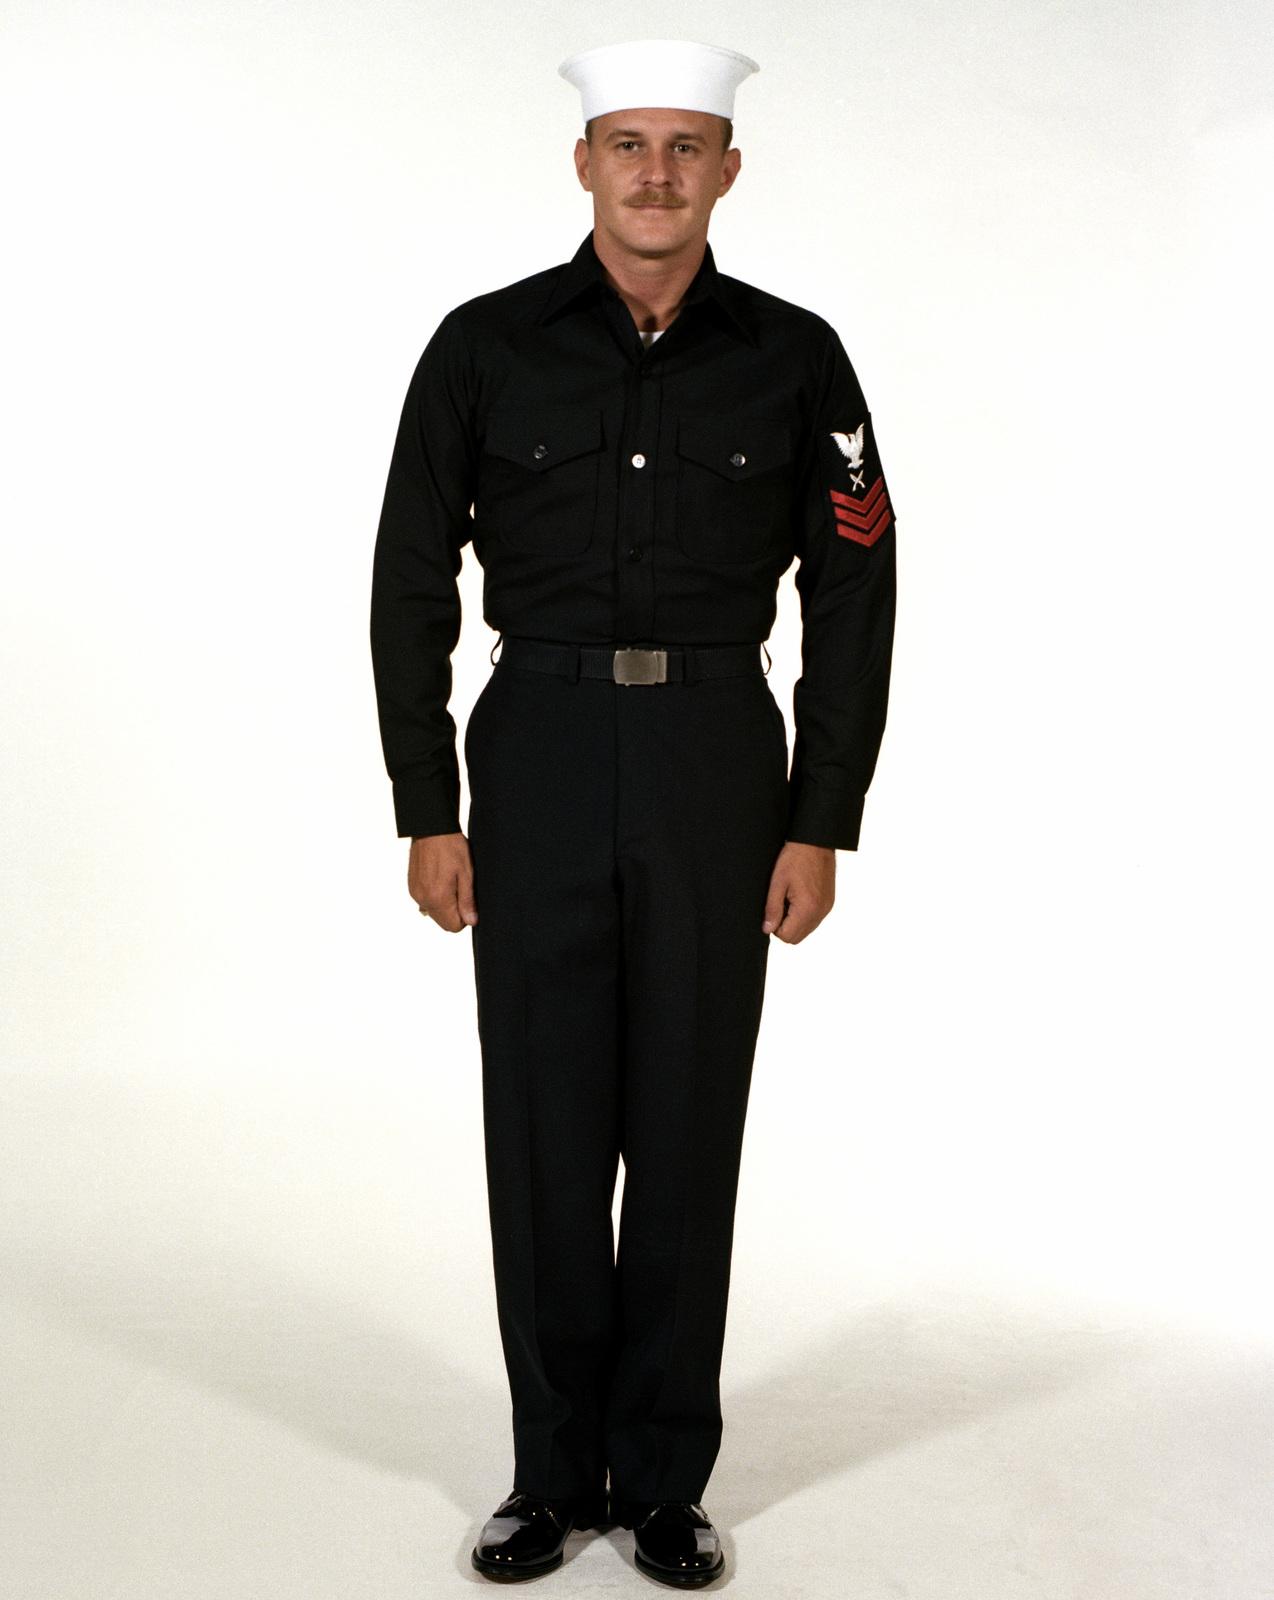 Navy Dress Blues Regulations Enlisted